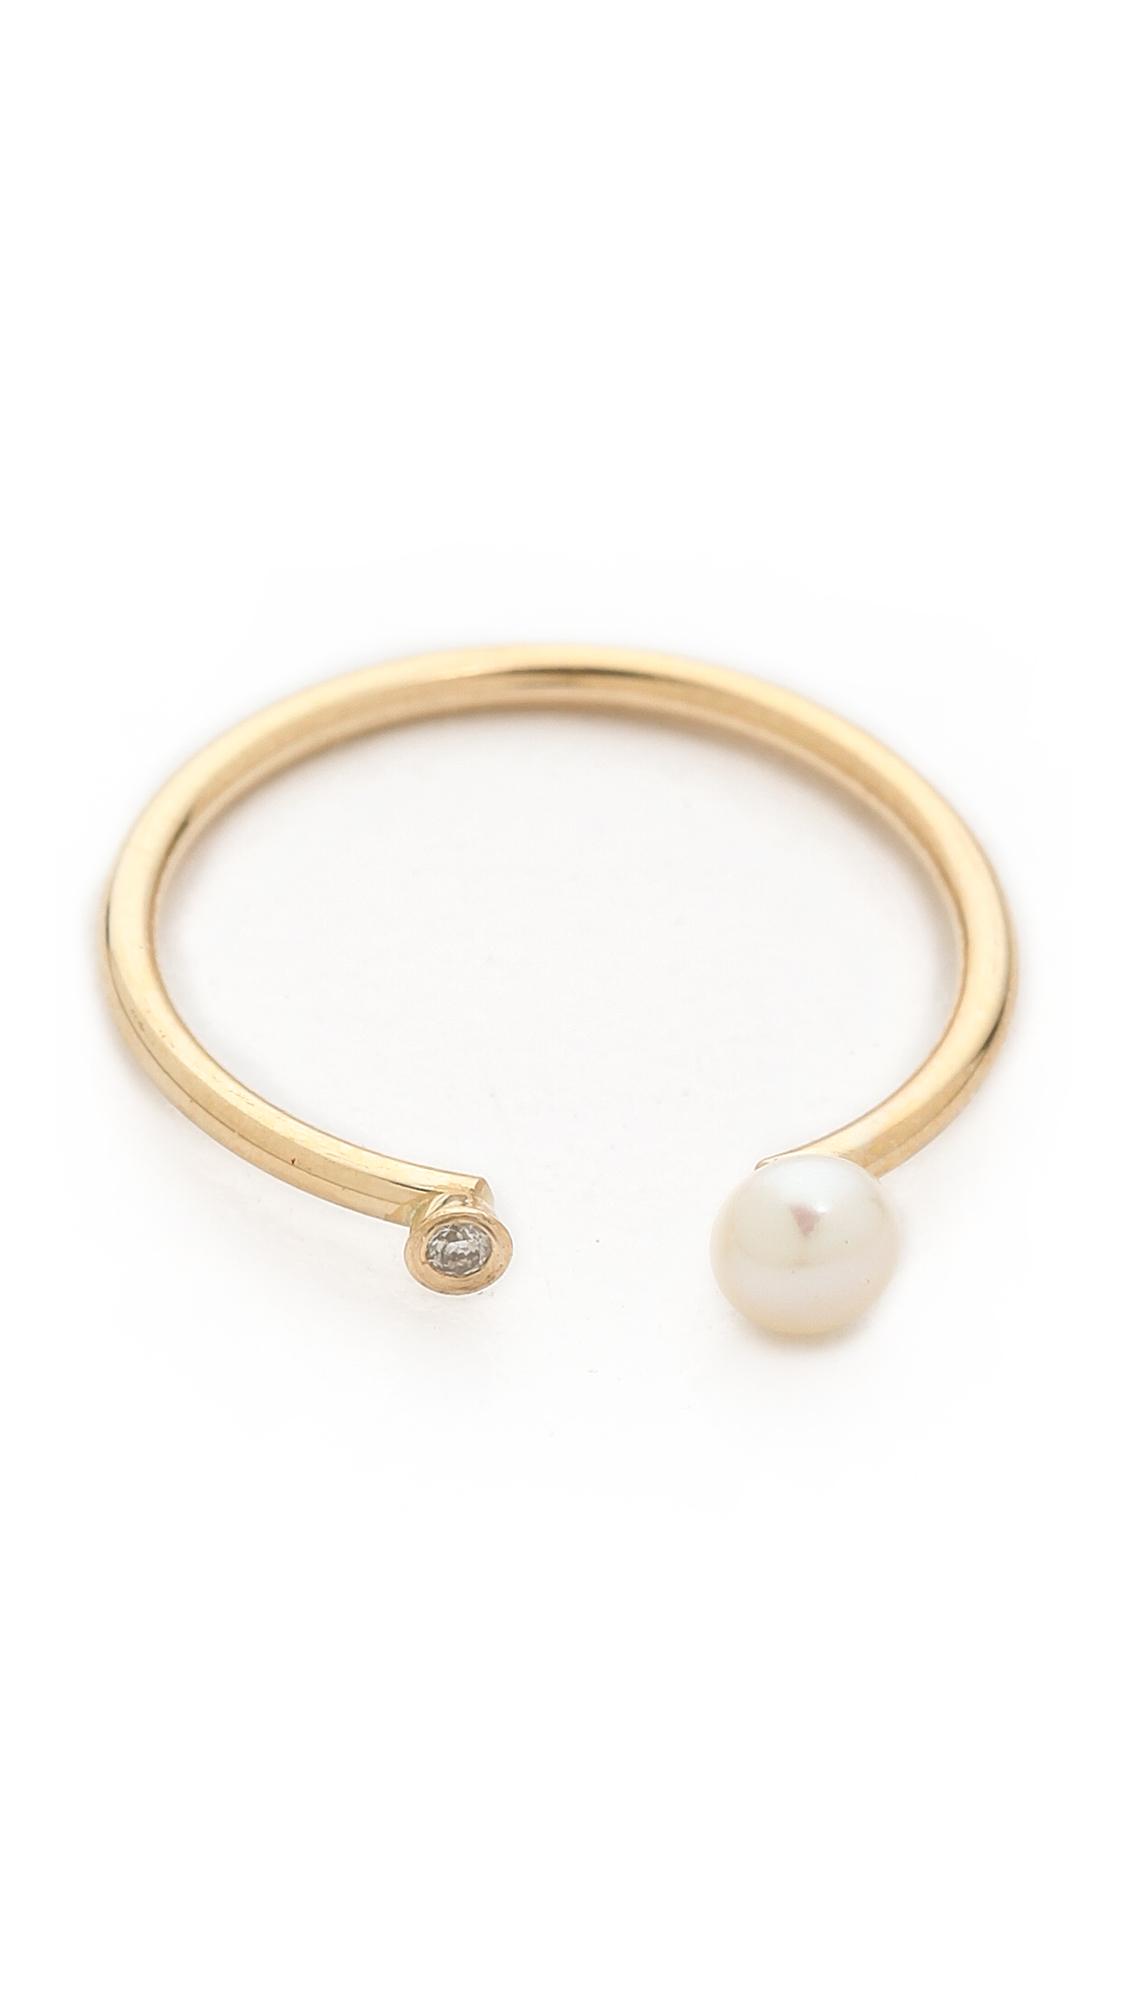 Ariel Gordon Jewelry Pearl & Diamond Ring tlIWX